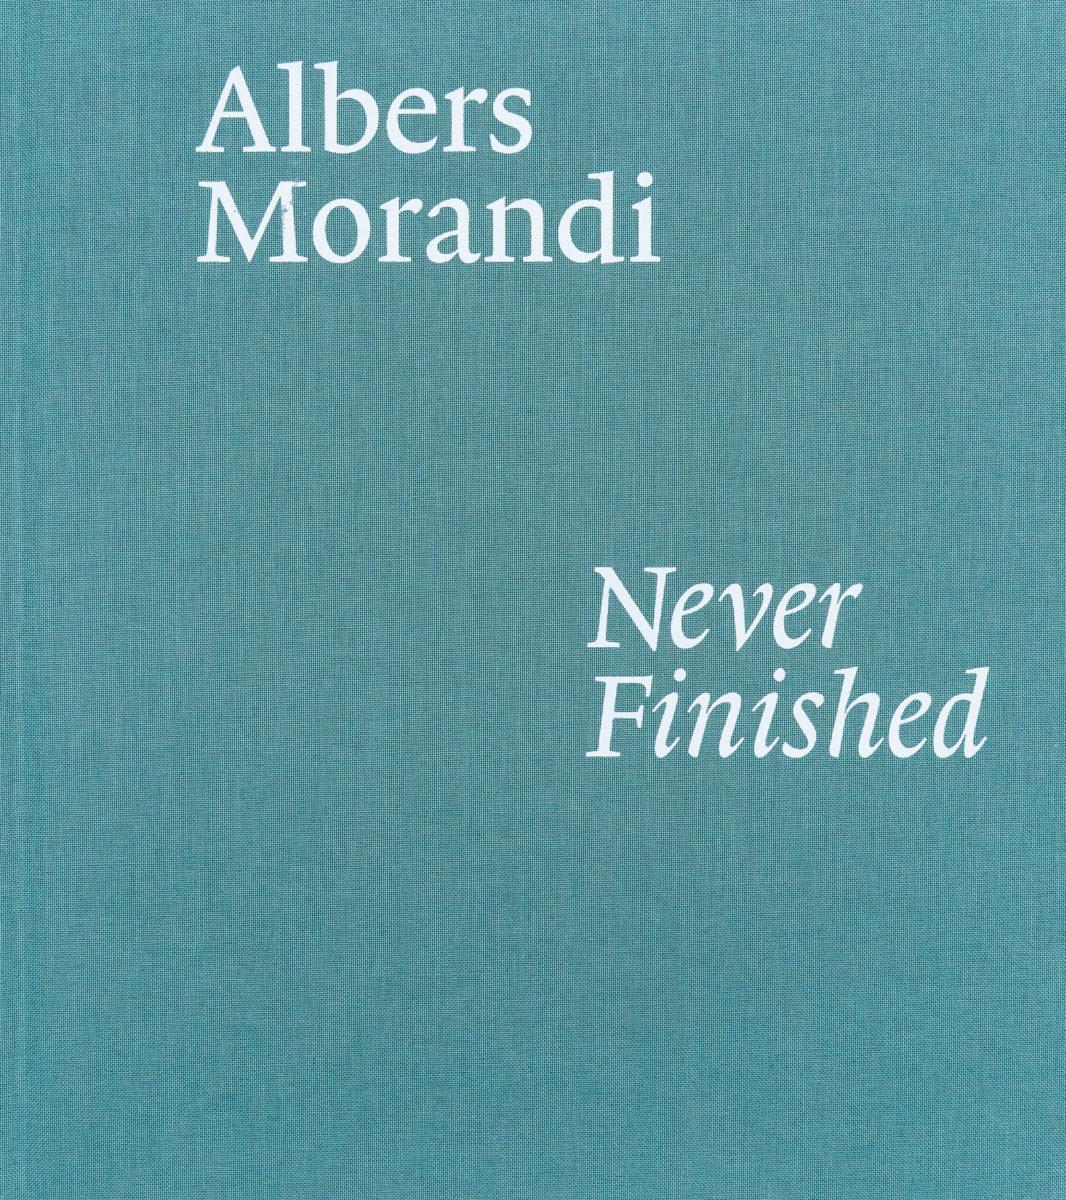 Albers & Morandi, Never Finished